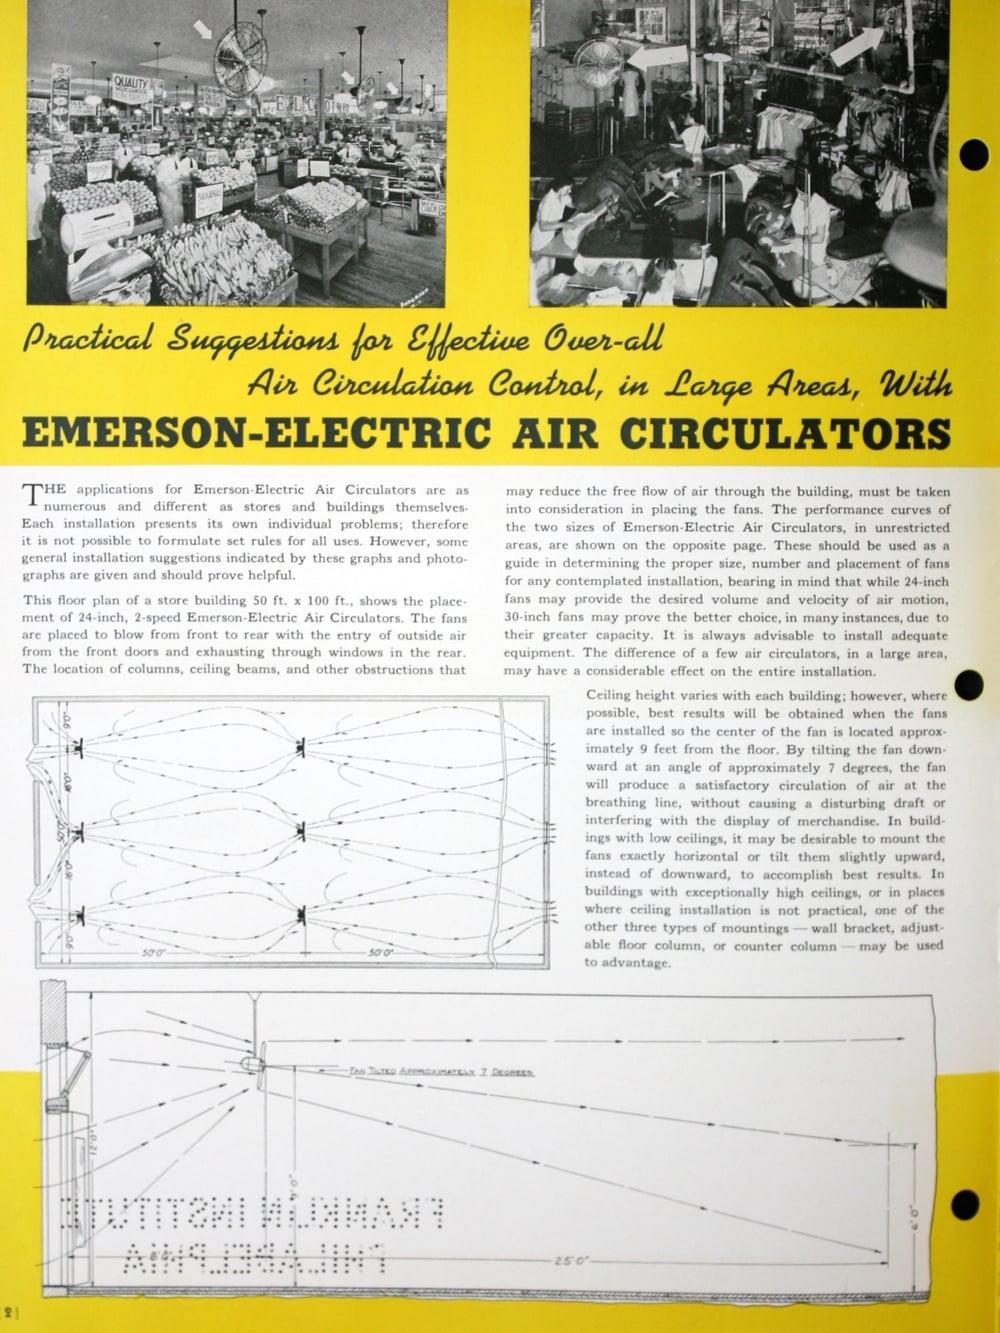 EmersonElectricCca42877_0001.jpg